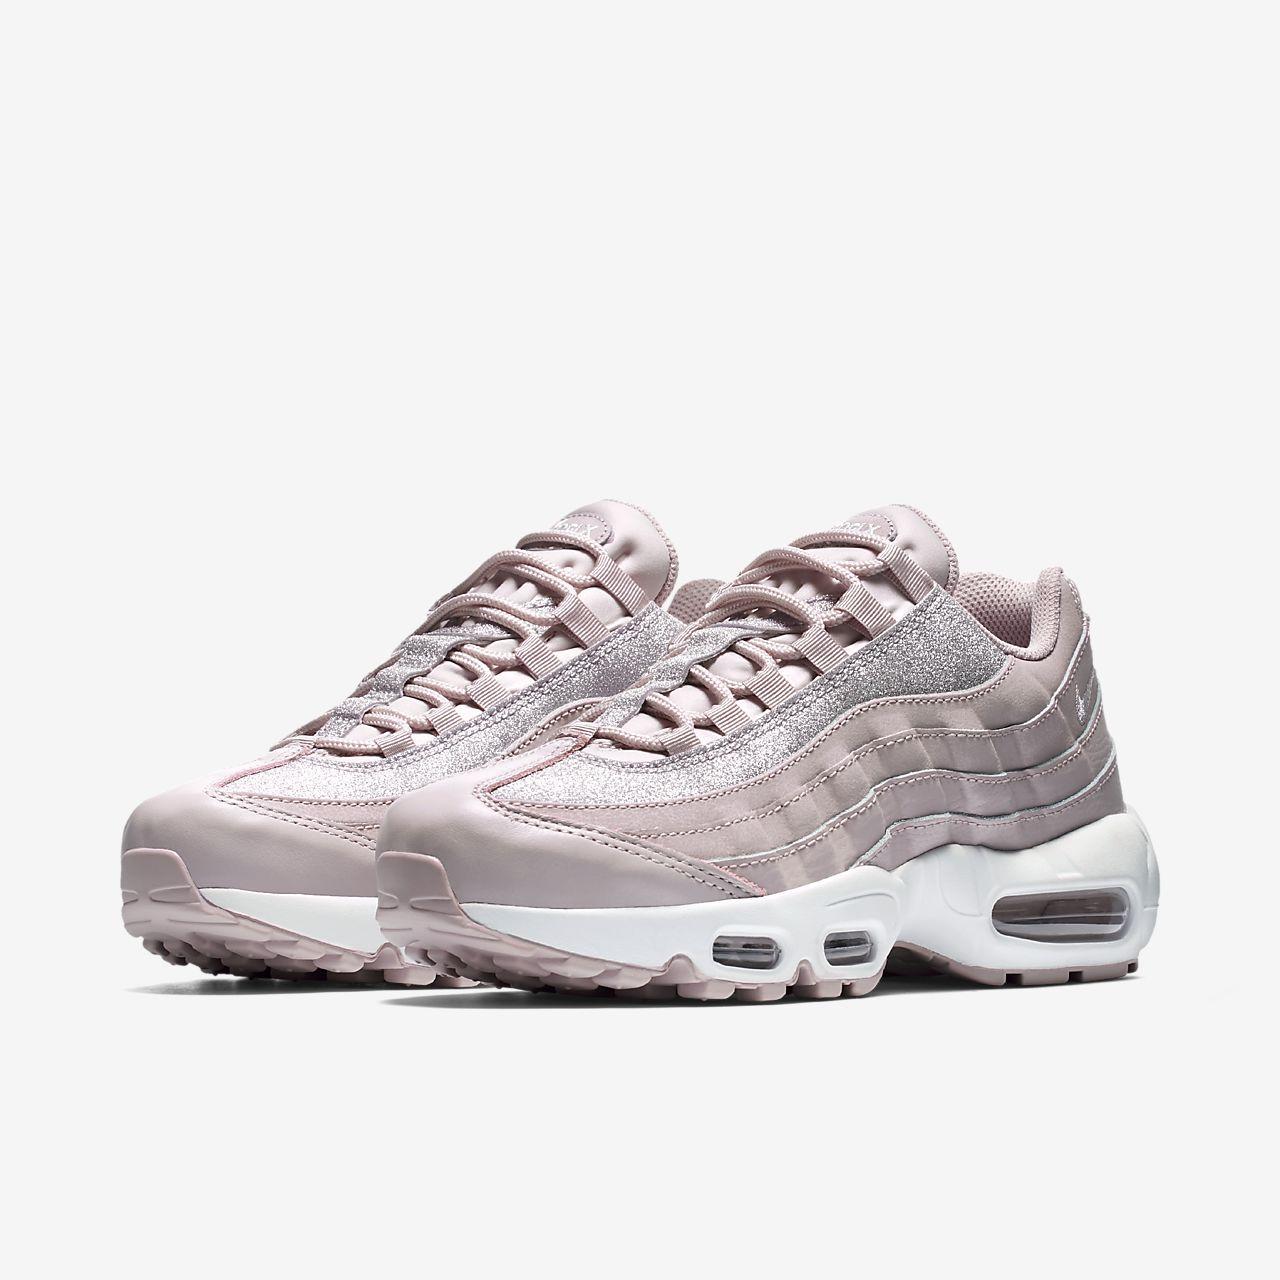 check out 50c50 580e6 ... aliexpress nike air max 95 se glitter womens shoe 88a59 cf17c